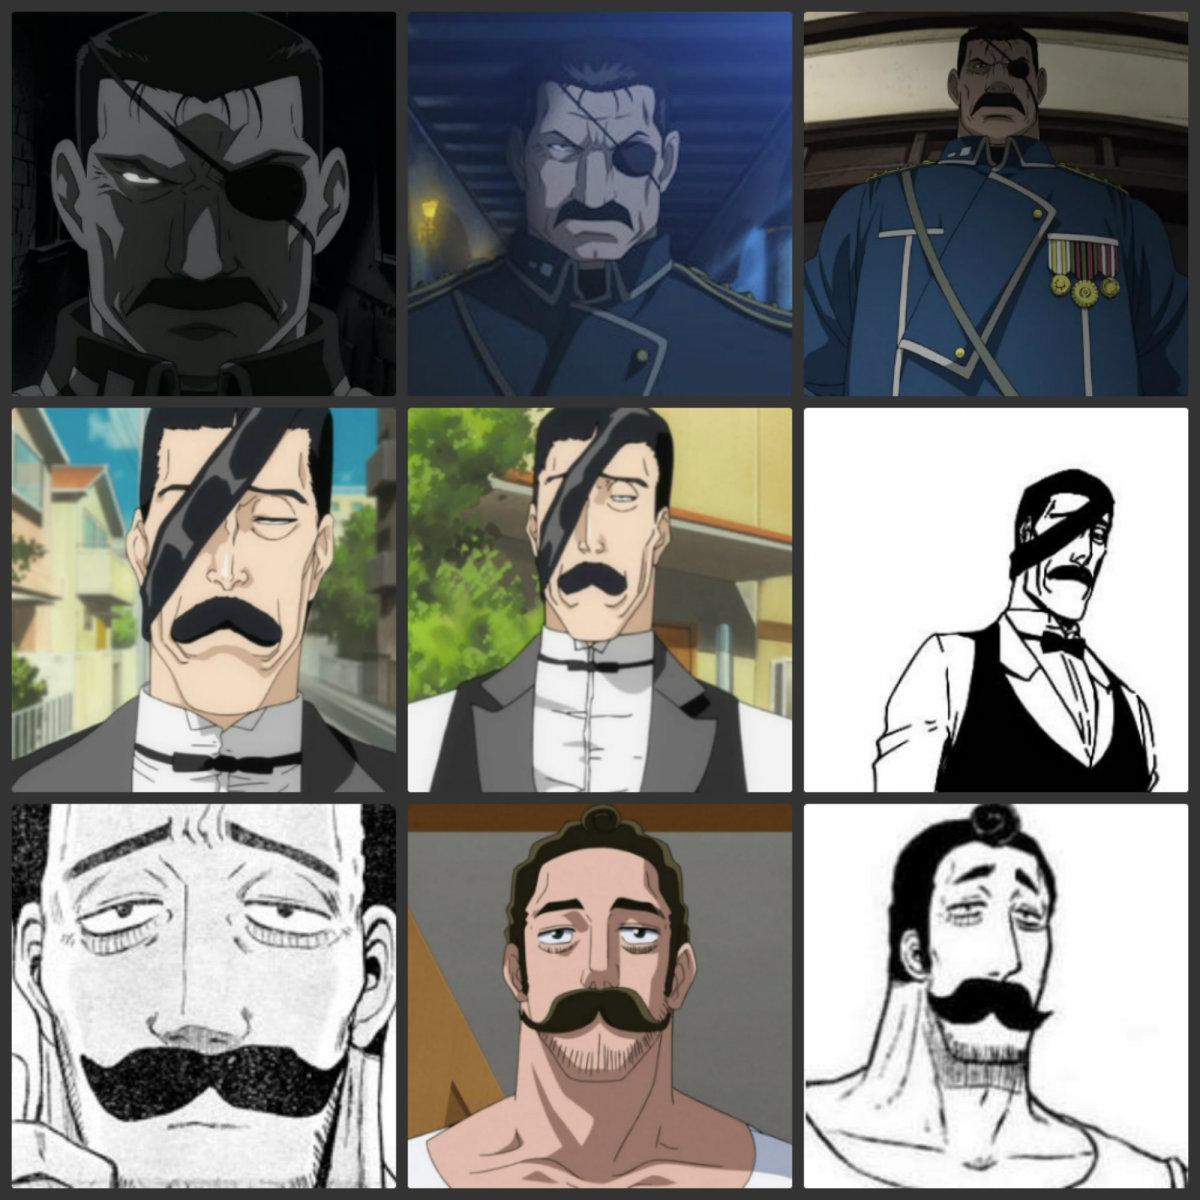 Anime Characters Look Alike : Anime characters who look alike hubpages